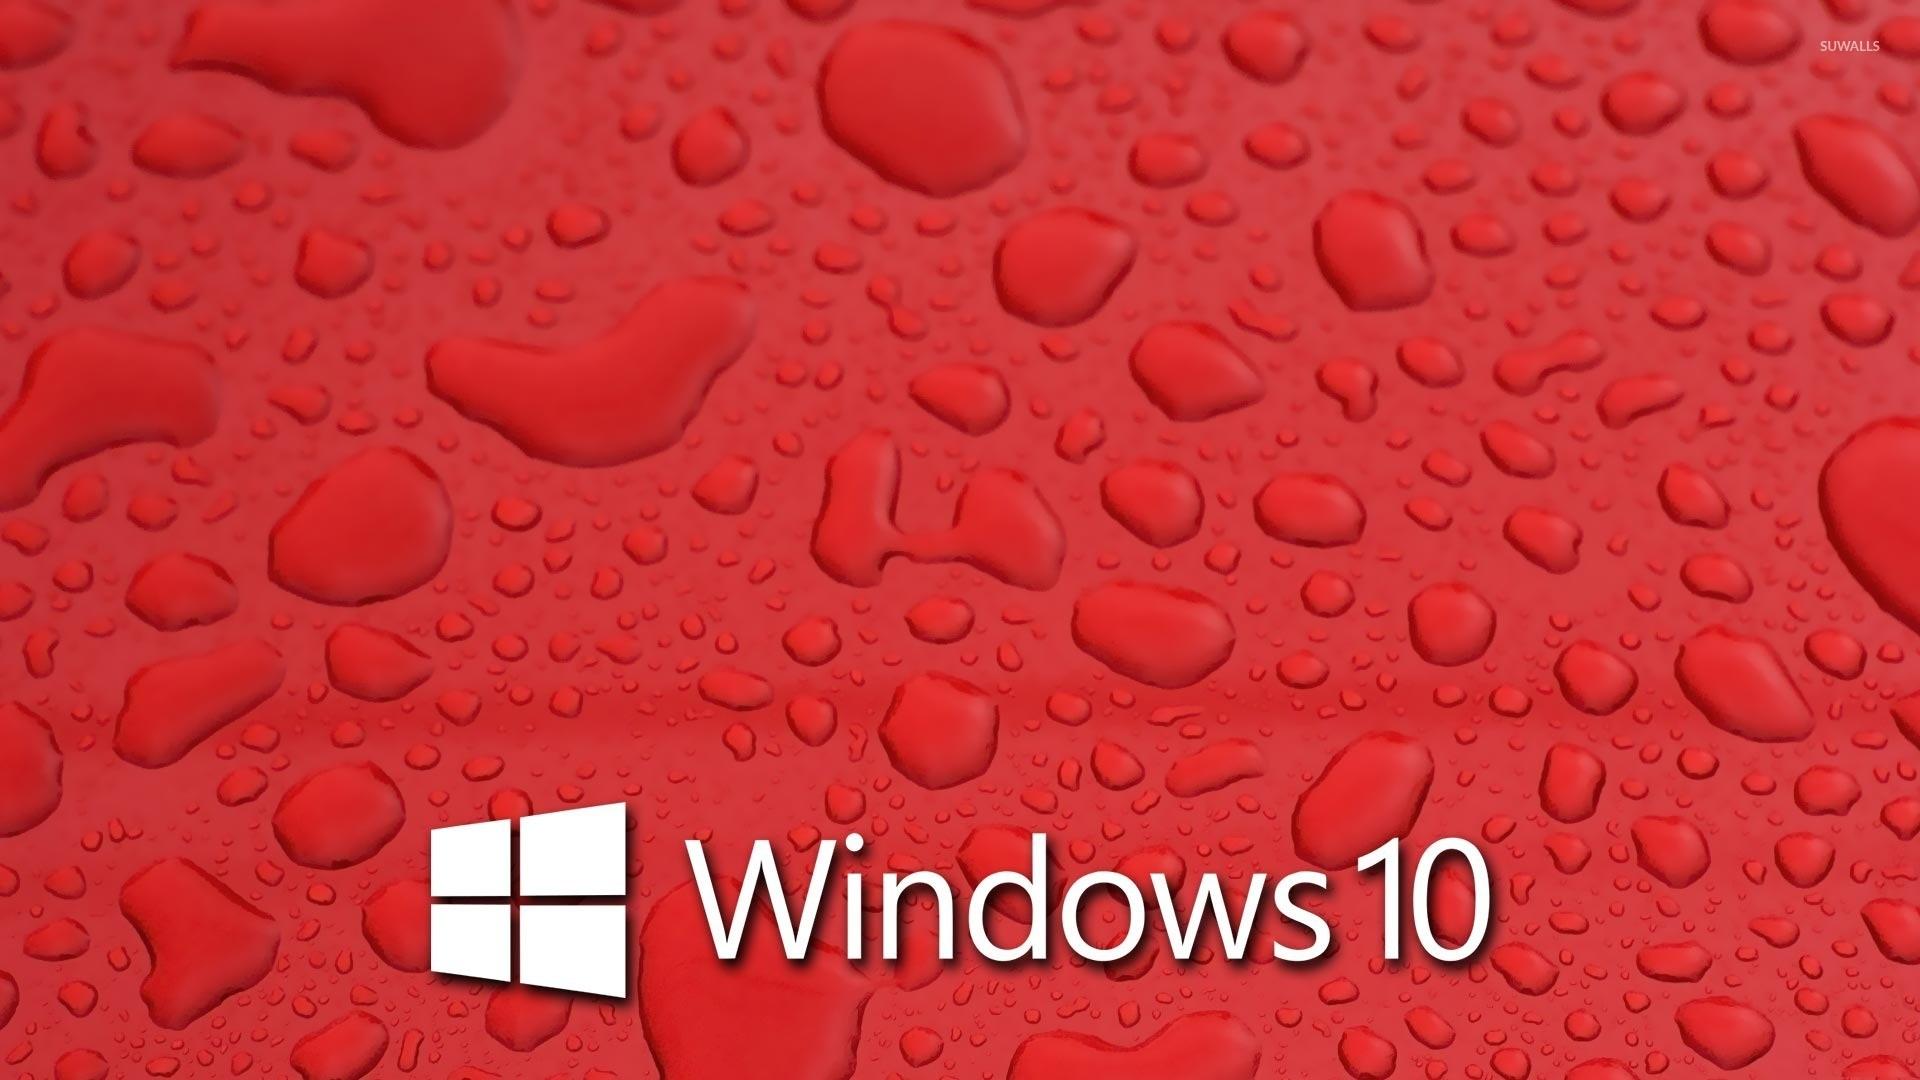 Windows 10 on blue hydrangeas [4] wallpaper – Computer wallpapers .